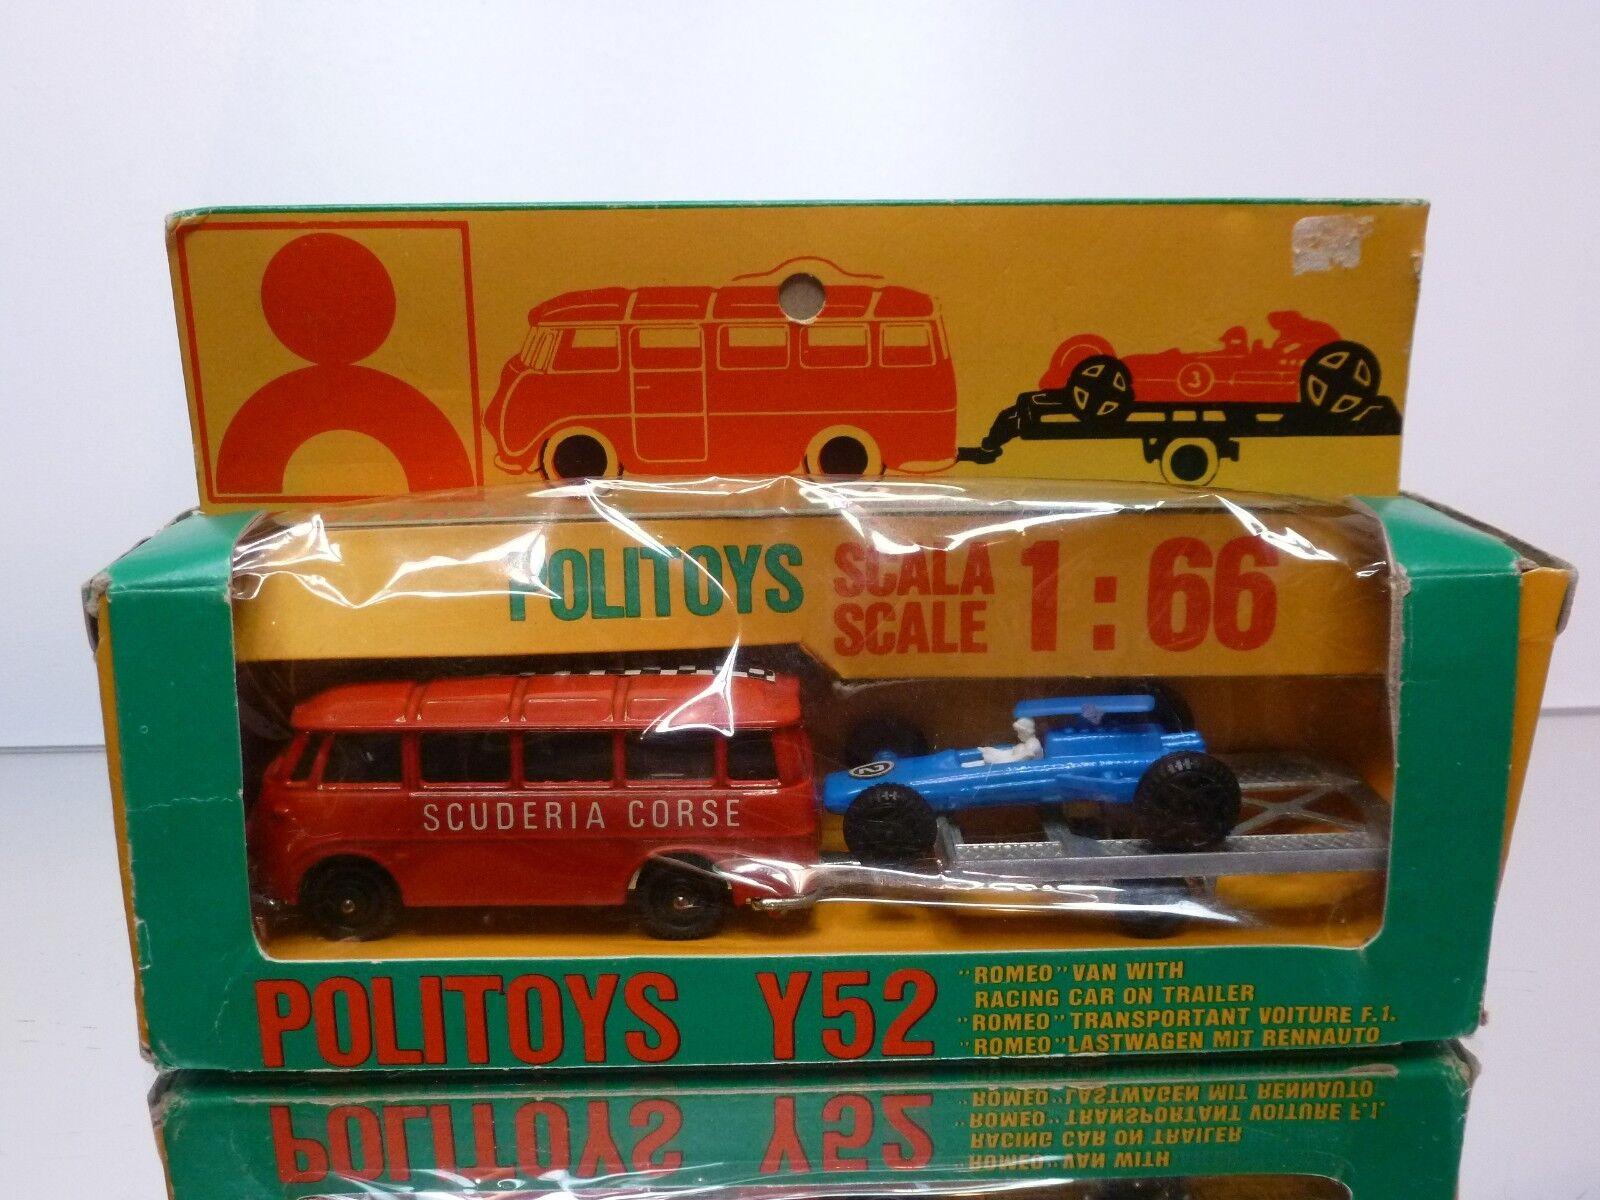 POLITOYS Y52 ALFA ROMEO VAN + F1 CAR ON TRAILER - 1:66 VERY RARE- GOOD IN BOX